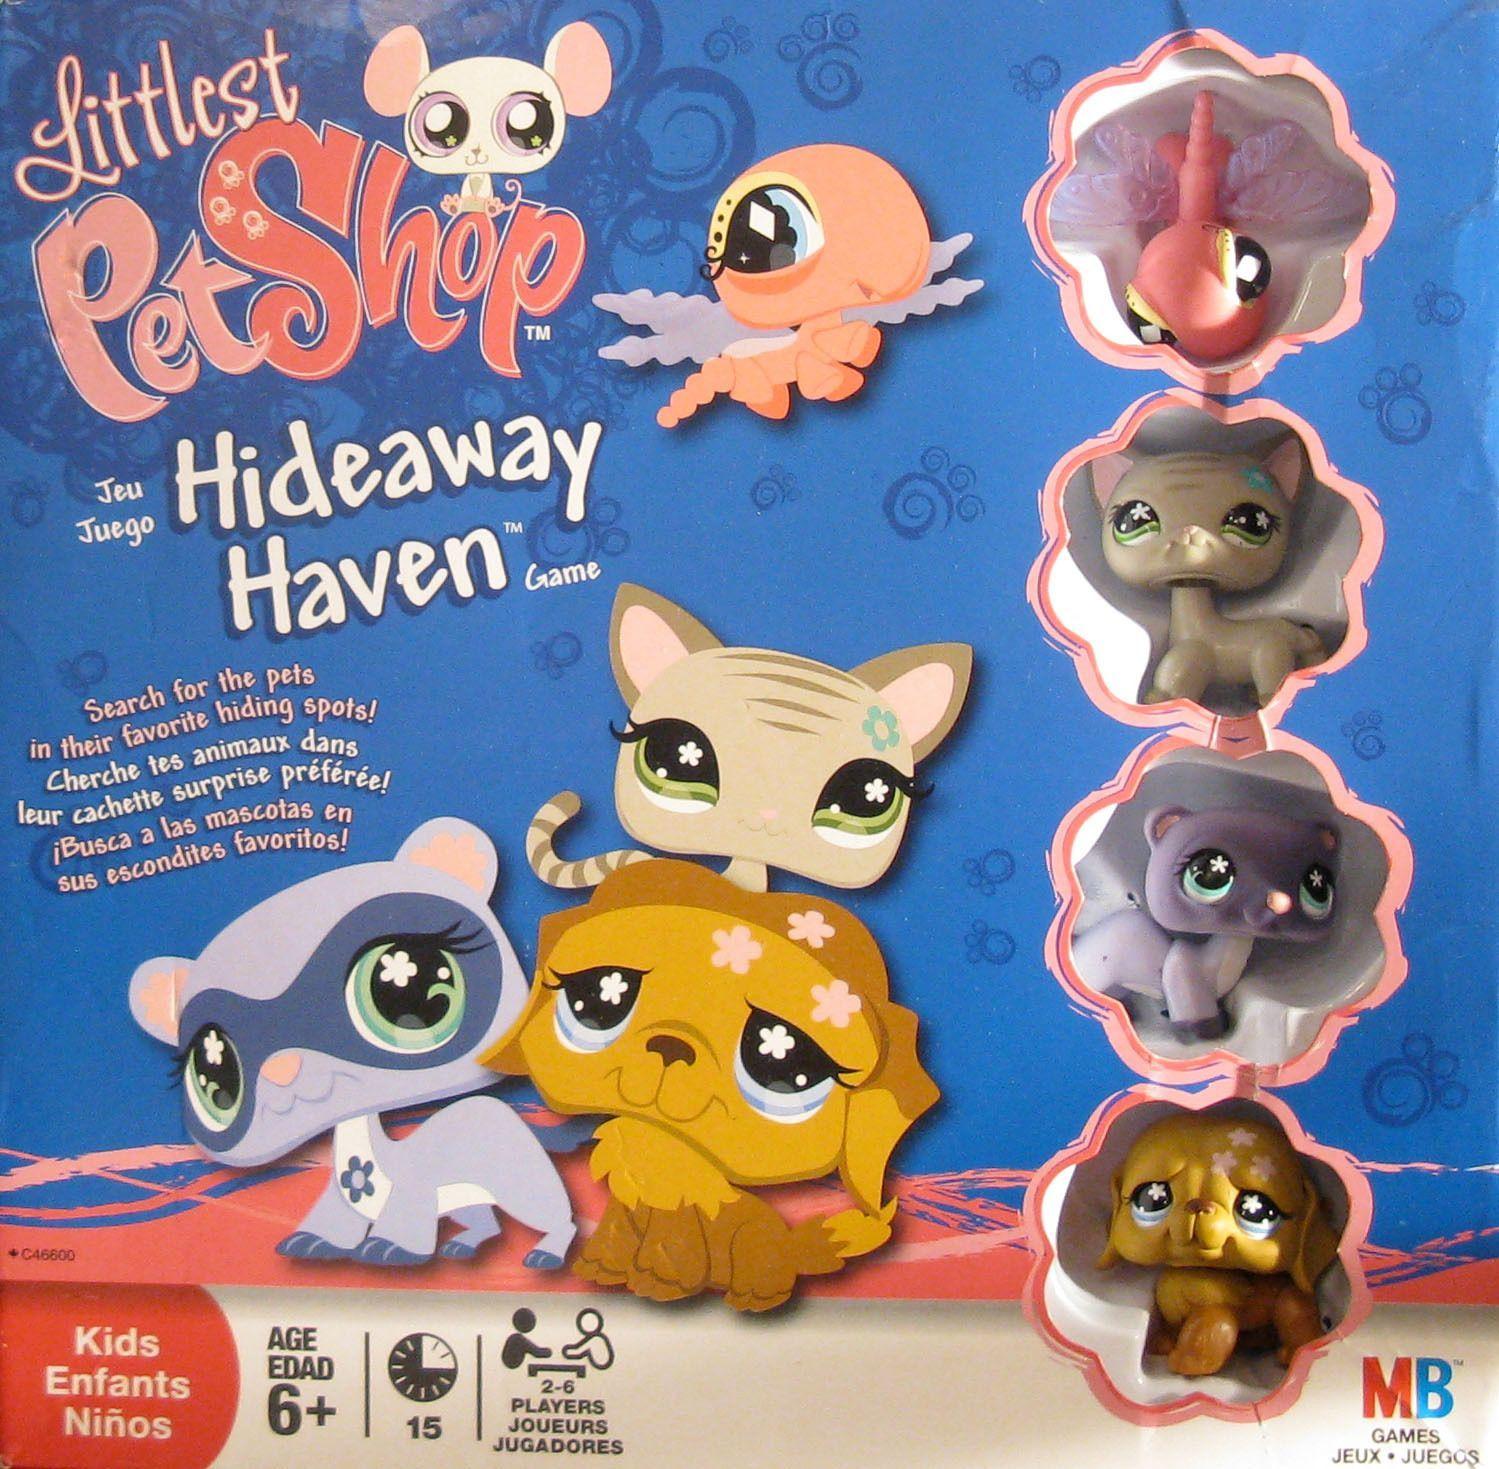 Littlest Pet Shop: Hideaway Haven Game